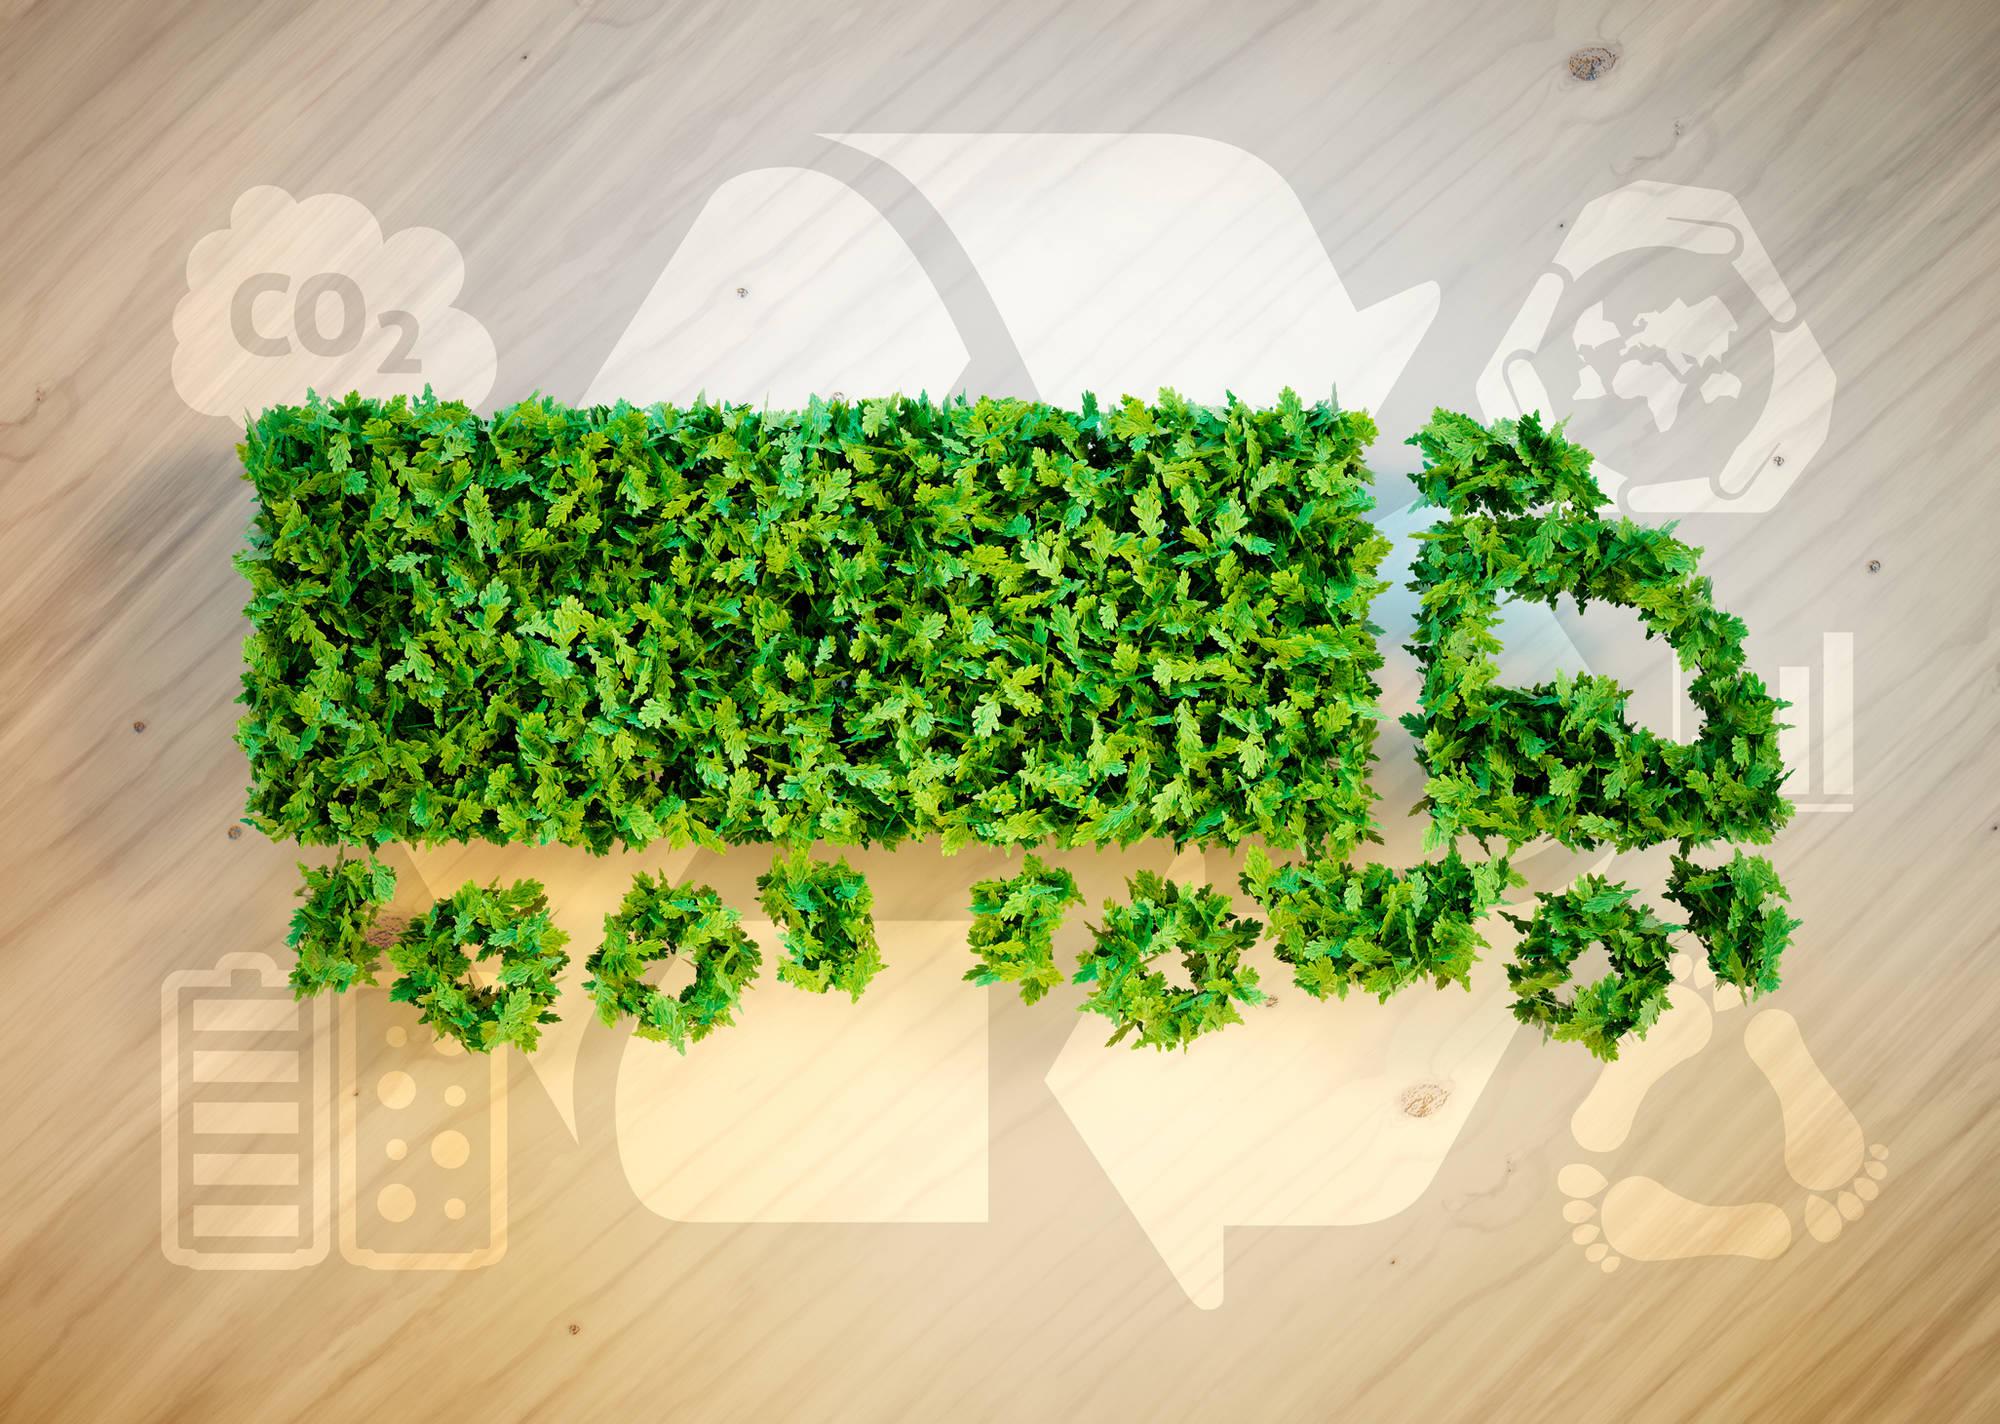 Logistica sostenibile, una priorità sempre più urgente